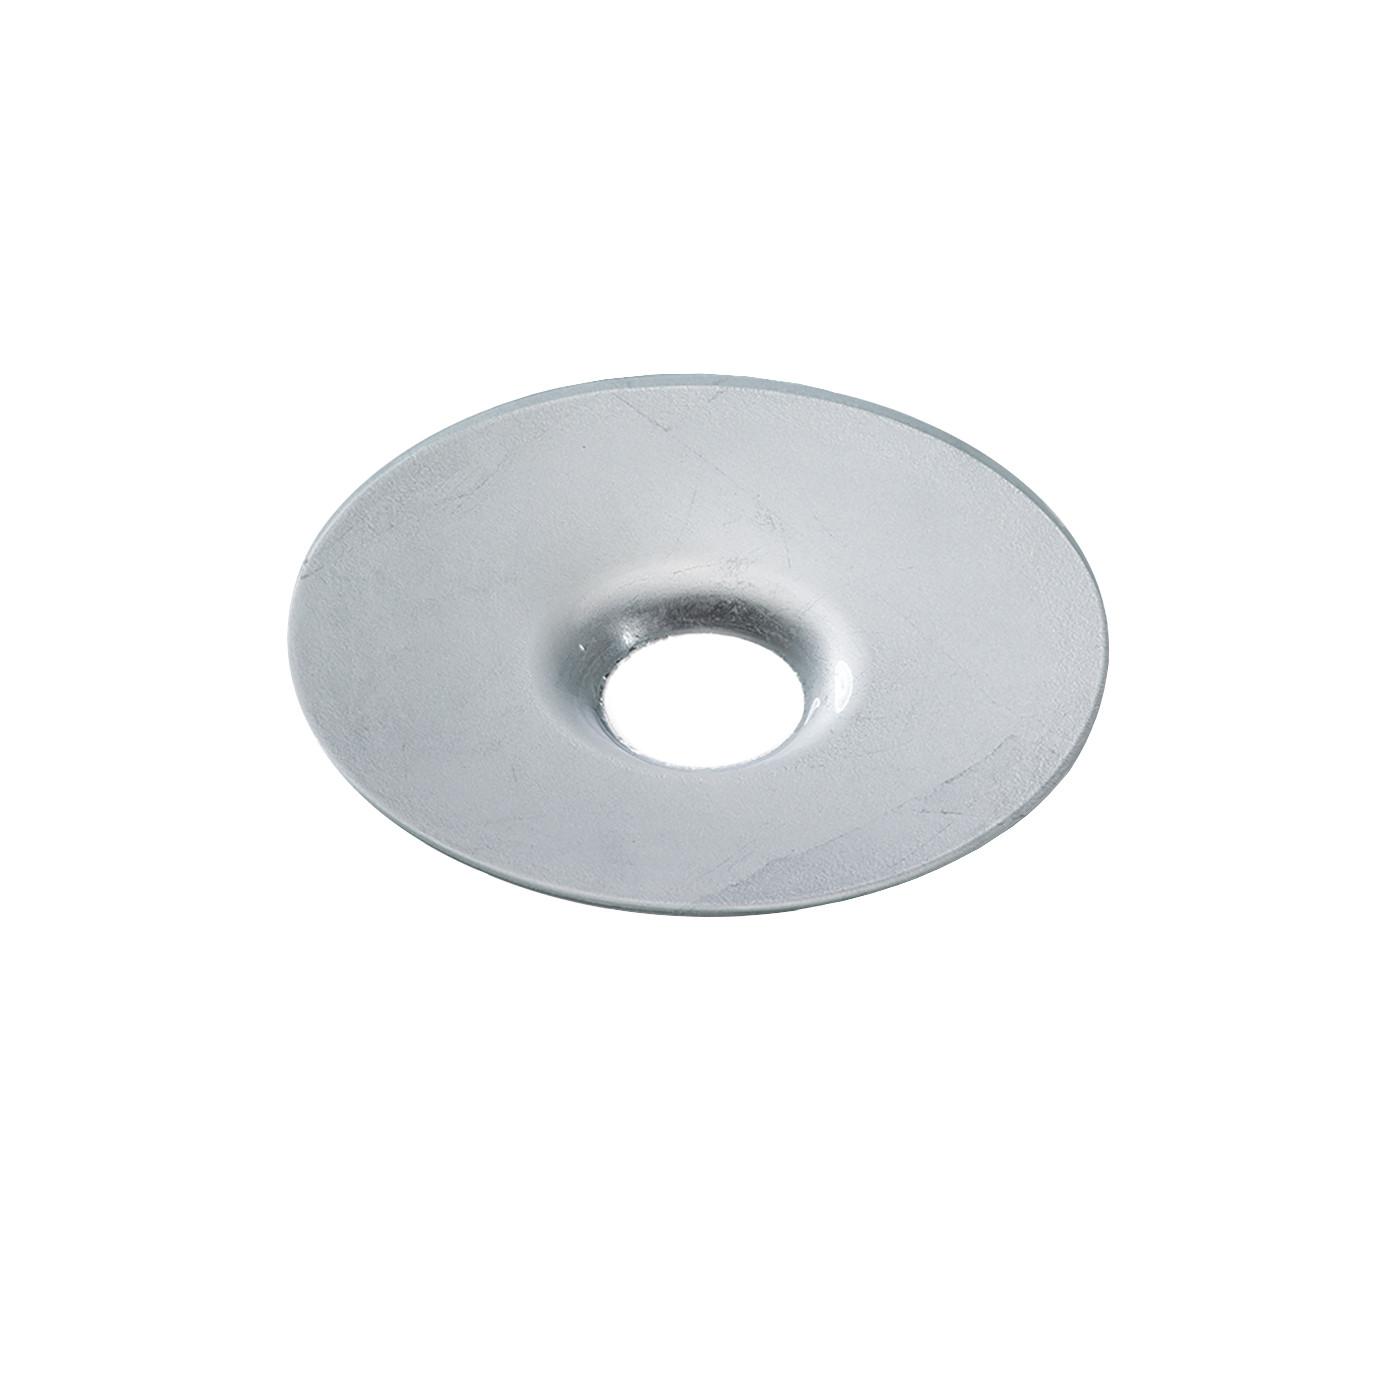 Elesi Luce Mir 00701 Ceiling Lamp